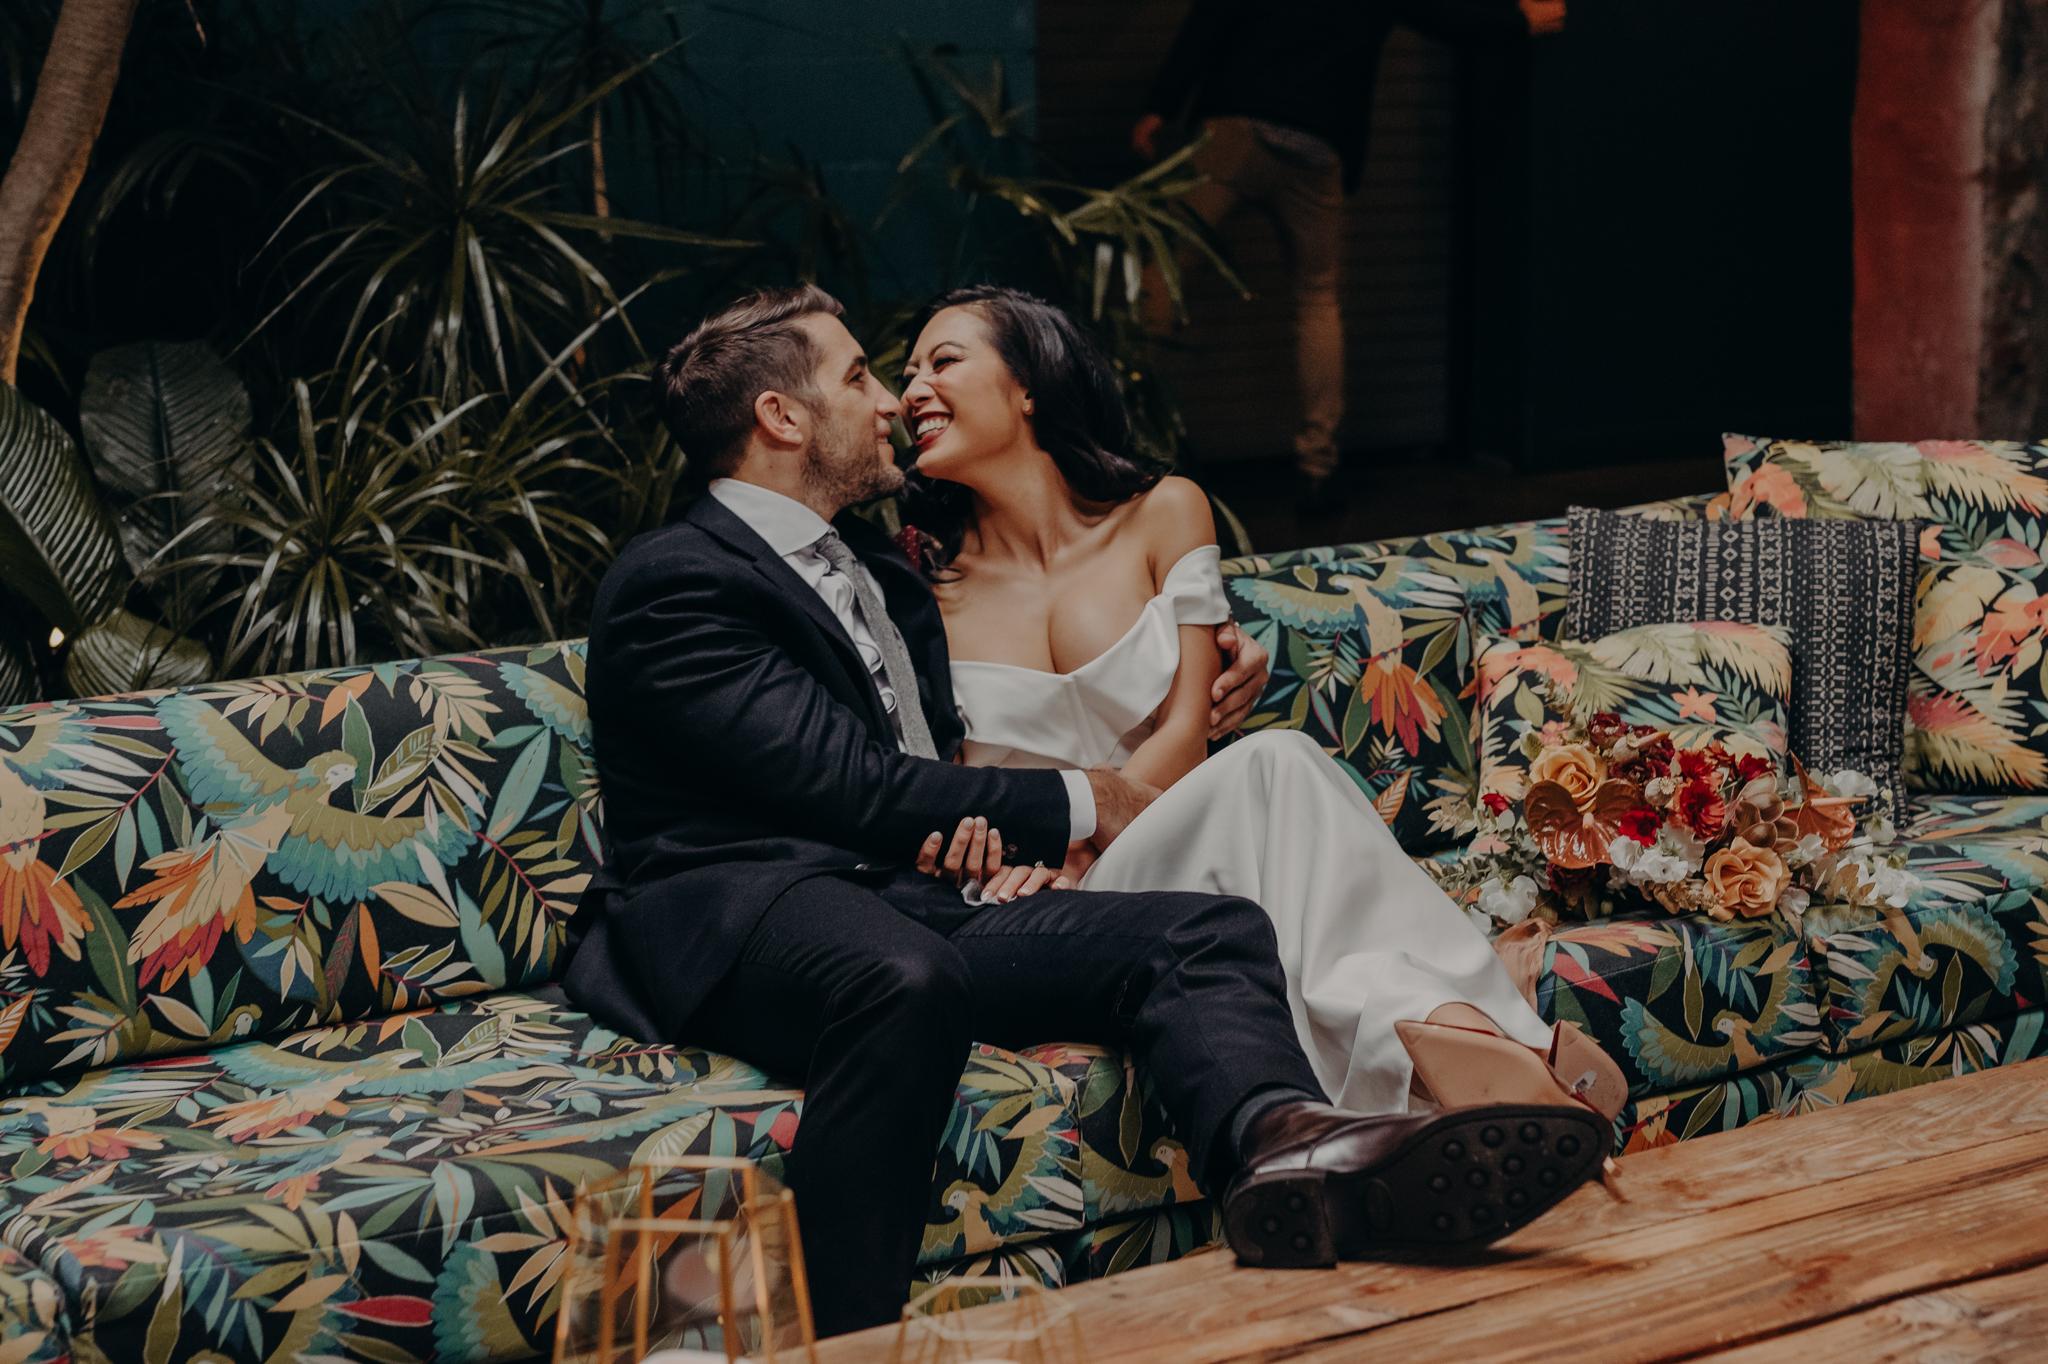 Wedding Photo LA - wedding photographer in los angeles - millwick wedding venue -isaiahandtaylor.com-039.jpg